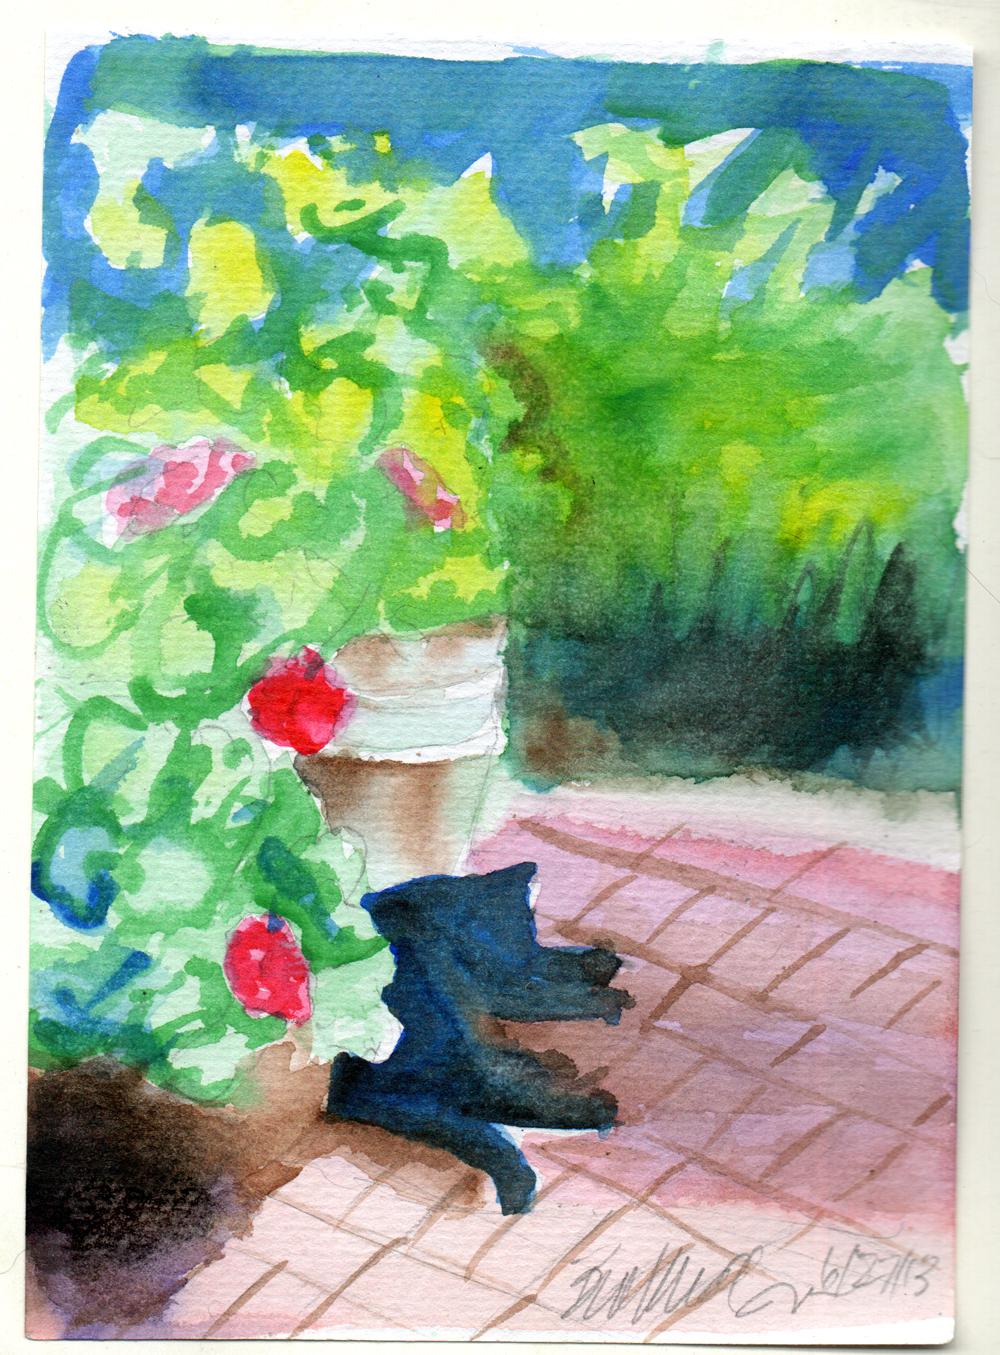 """Garden Sketch With Mimi"", 5"" x 7"", watercolor, 2013 © Bernadette E. Kazmarski"